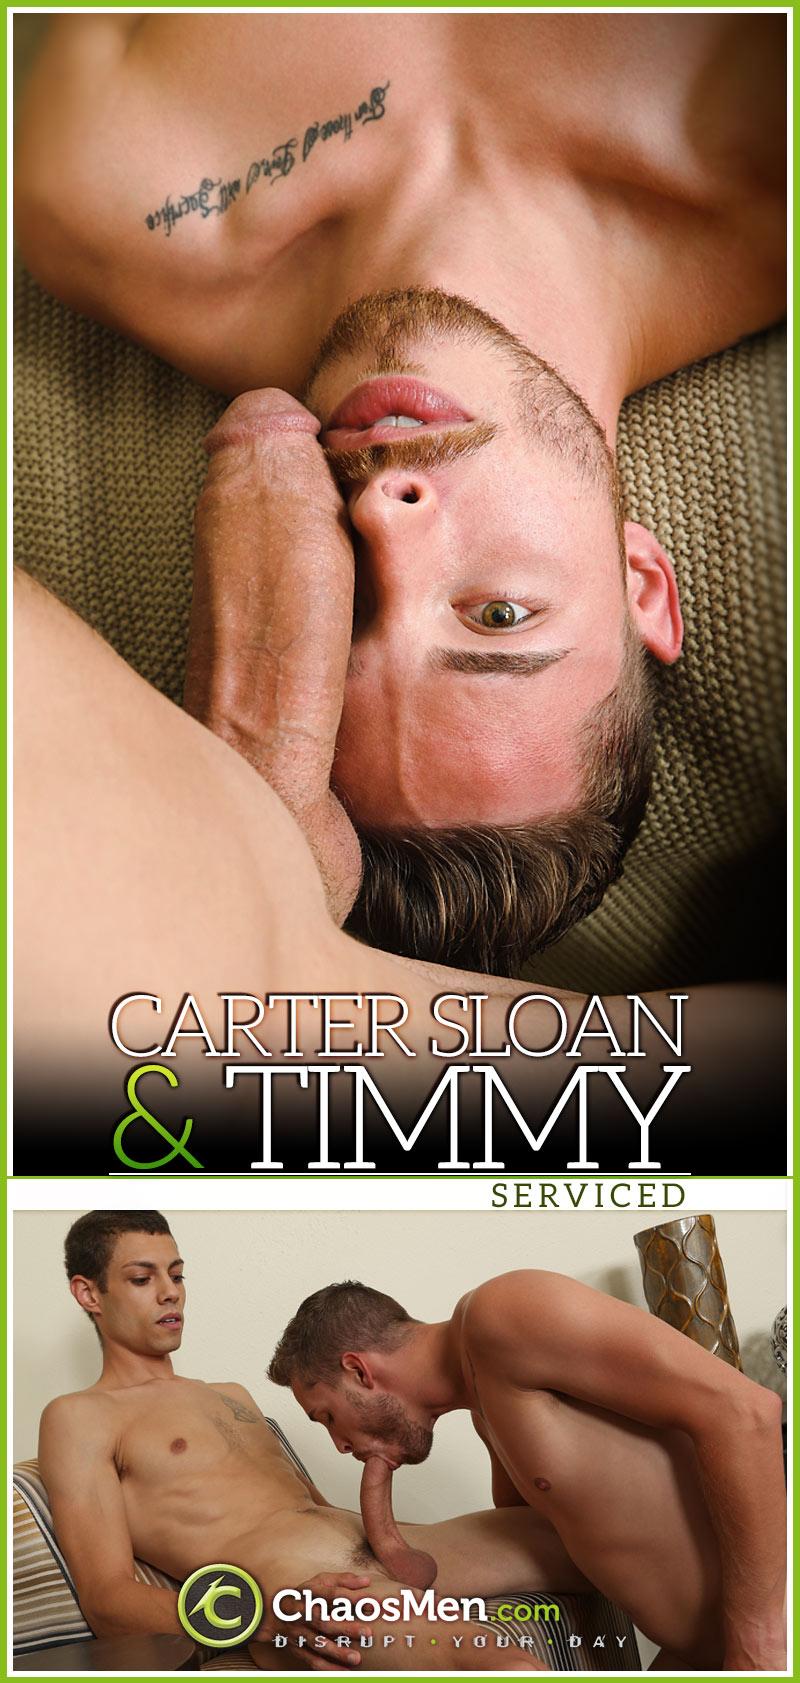 Carter Sloan & Timmy (Serviced) at ChaosMen